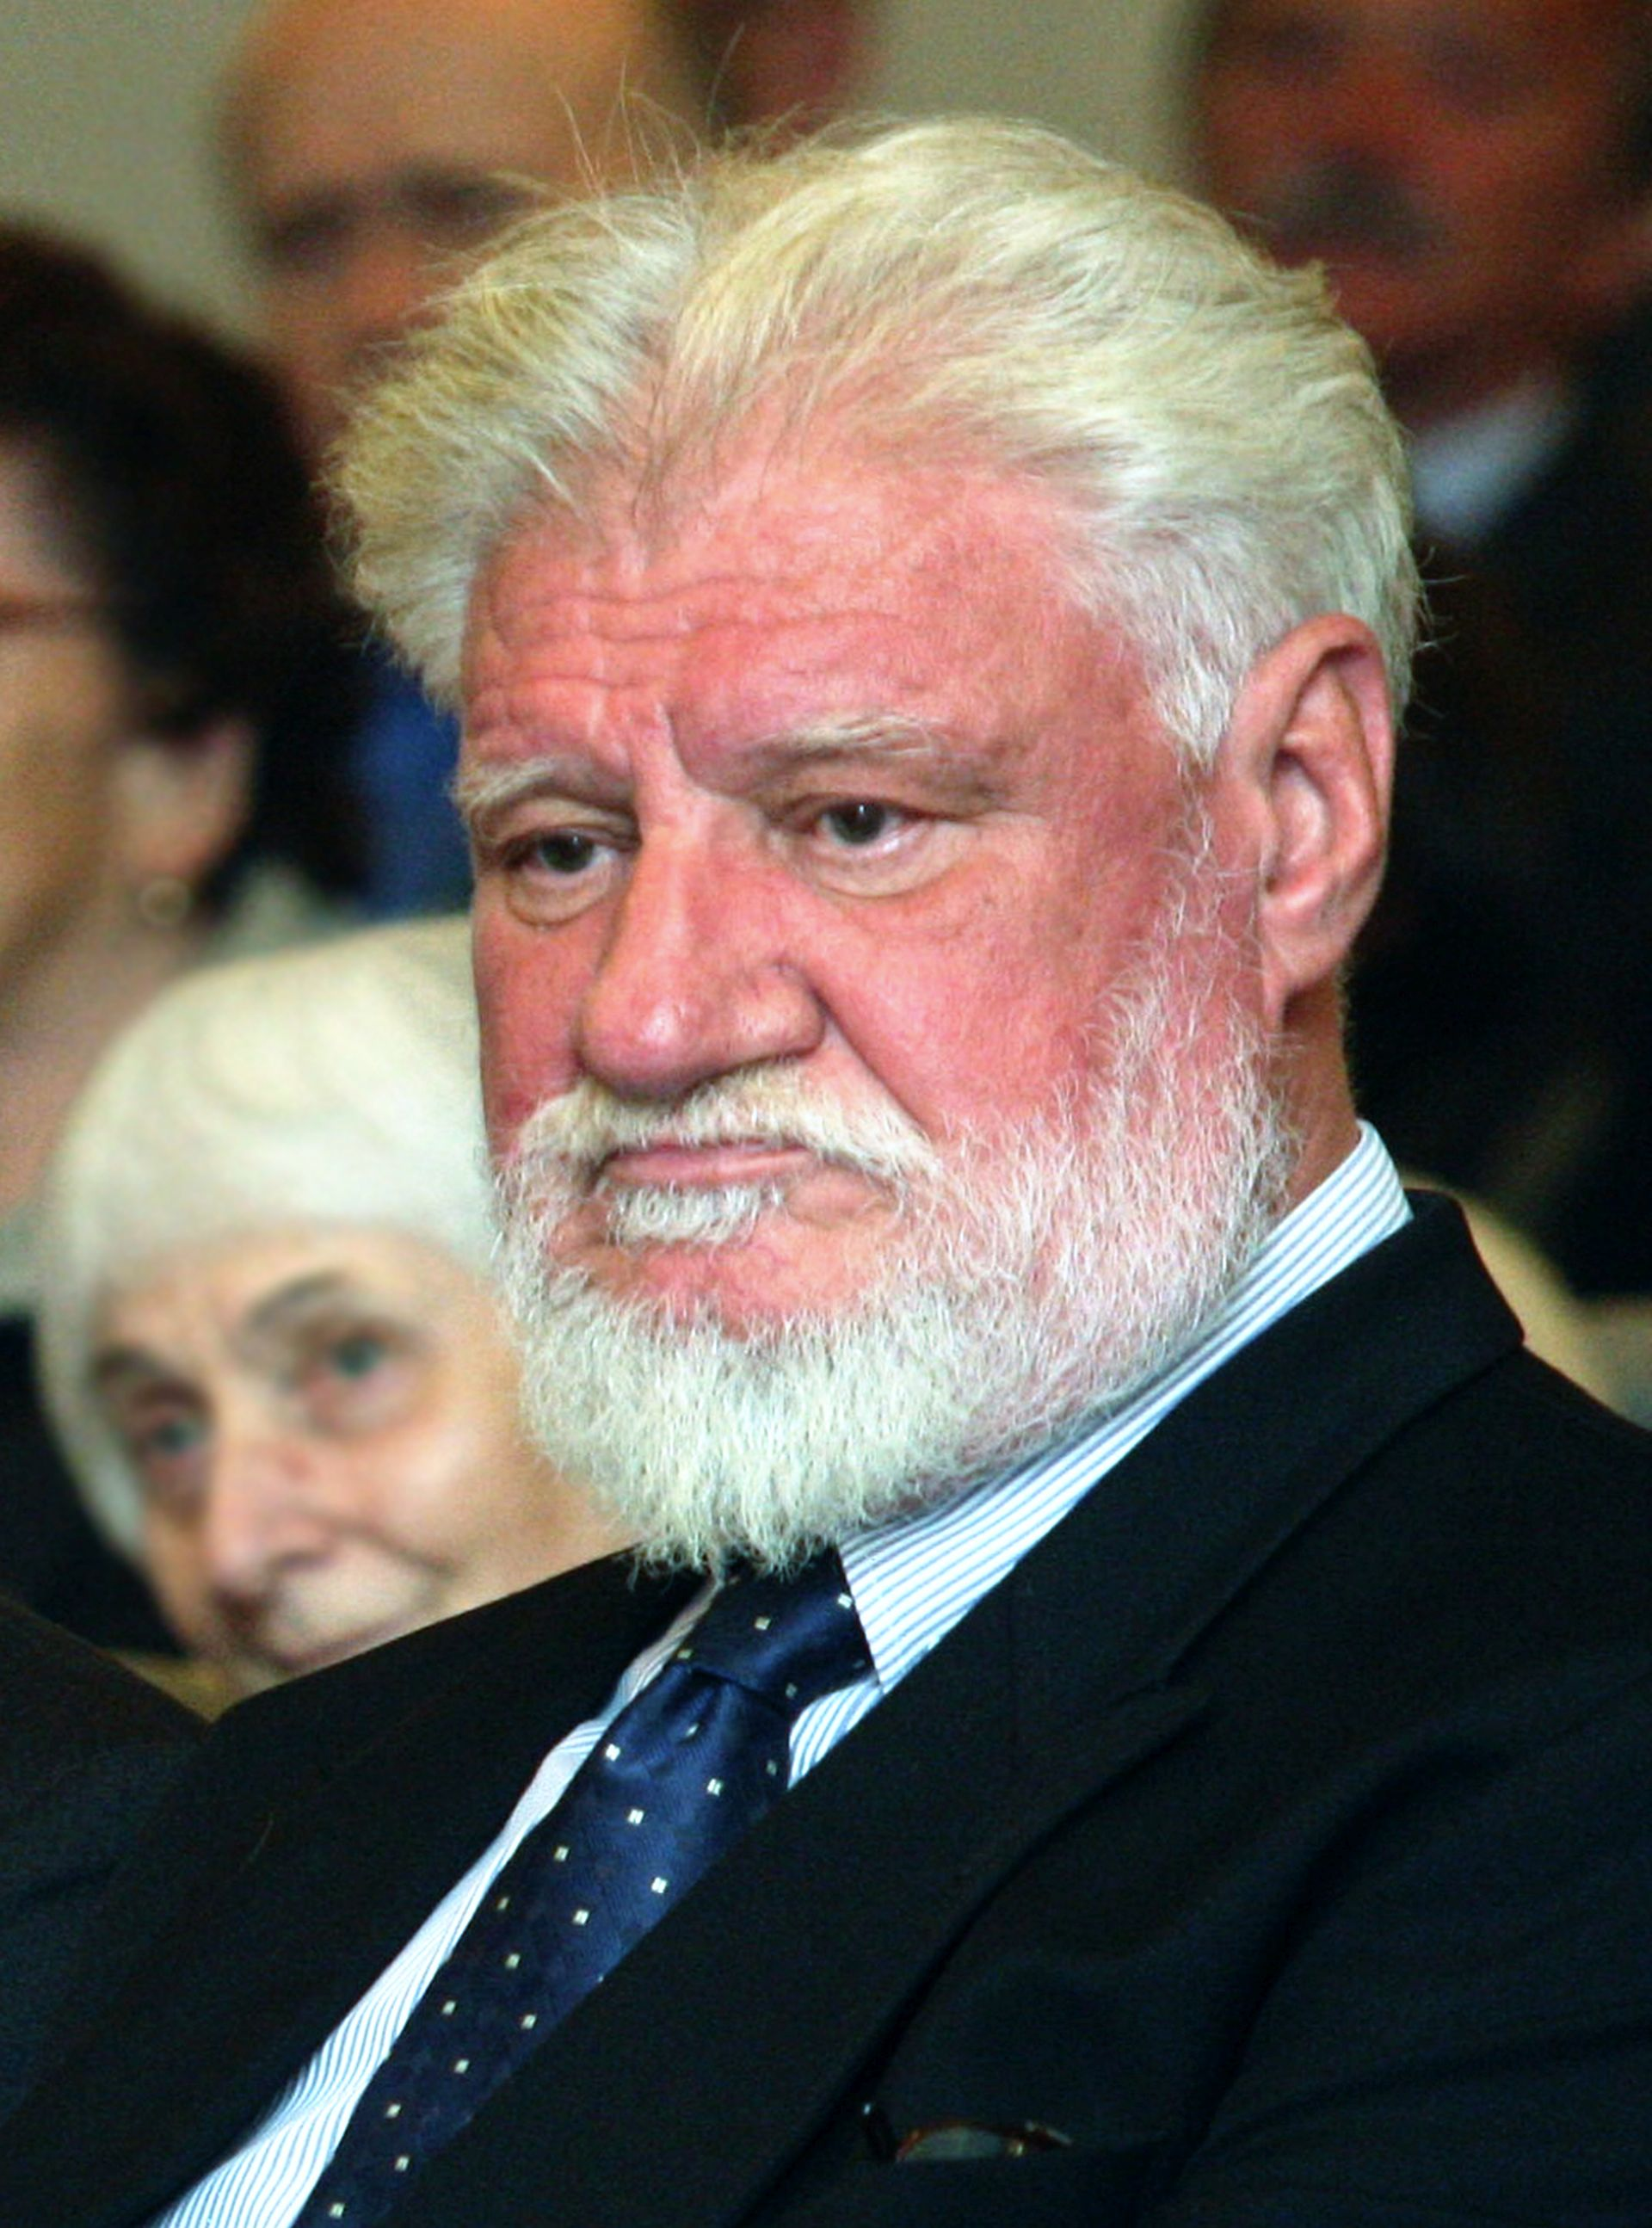 Ministarstvo pravosuđa Haškom sudu poslalo informacije o Praljkovoj imovini